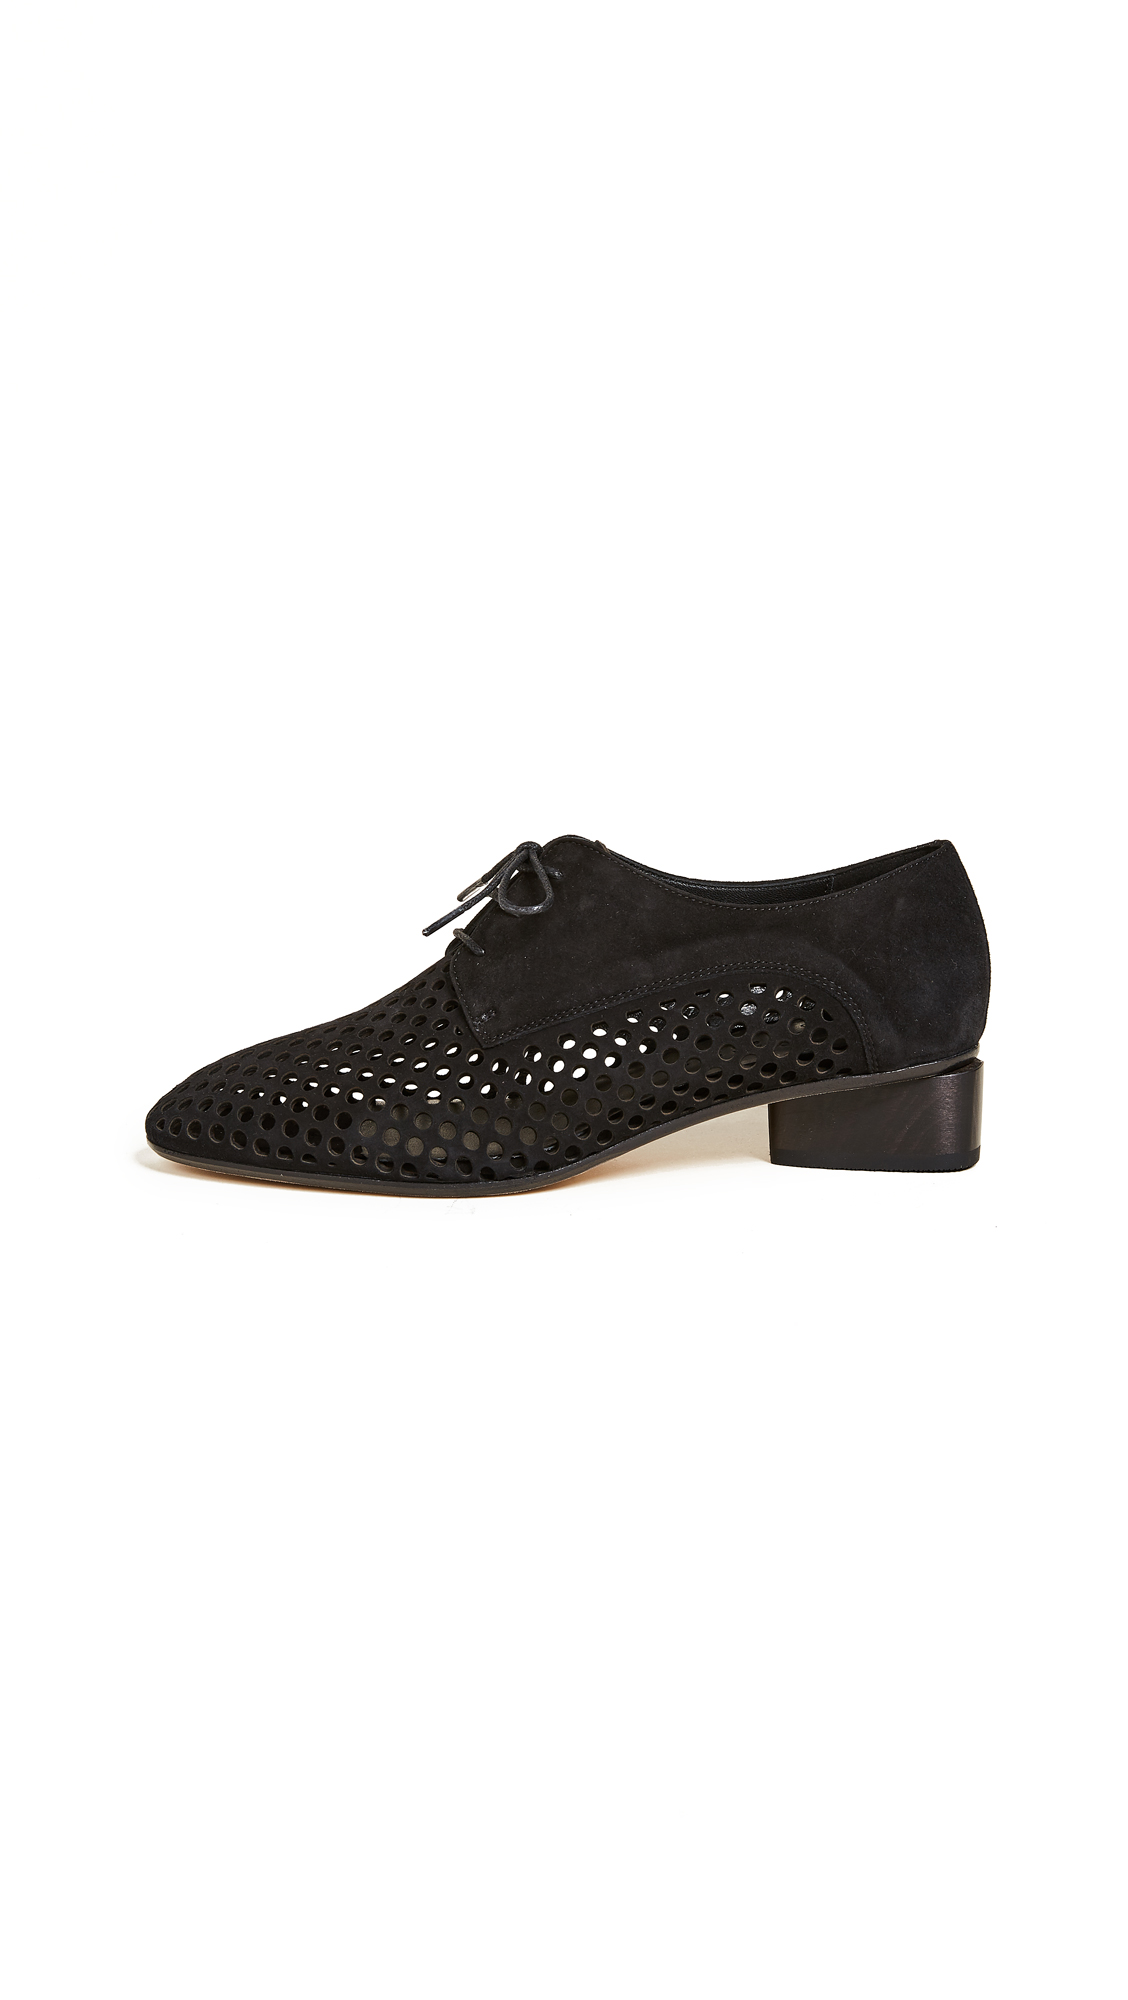 Zero + Maria Cornejo Bowie Perforated Loafers - Black